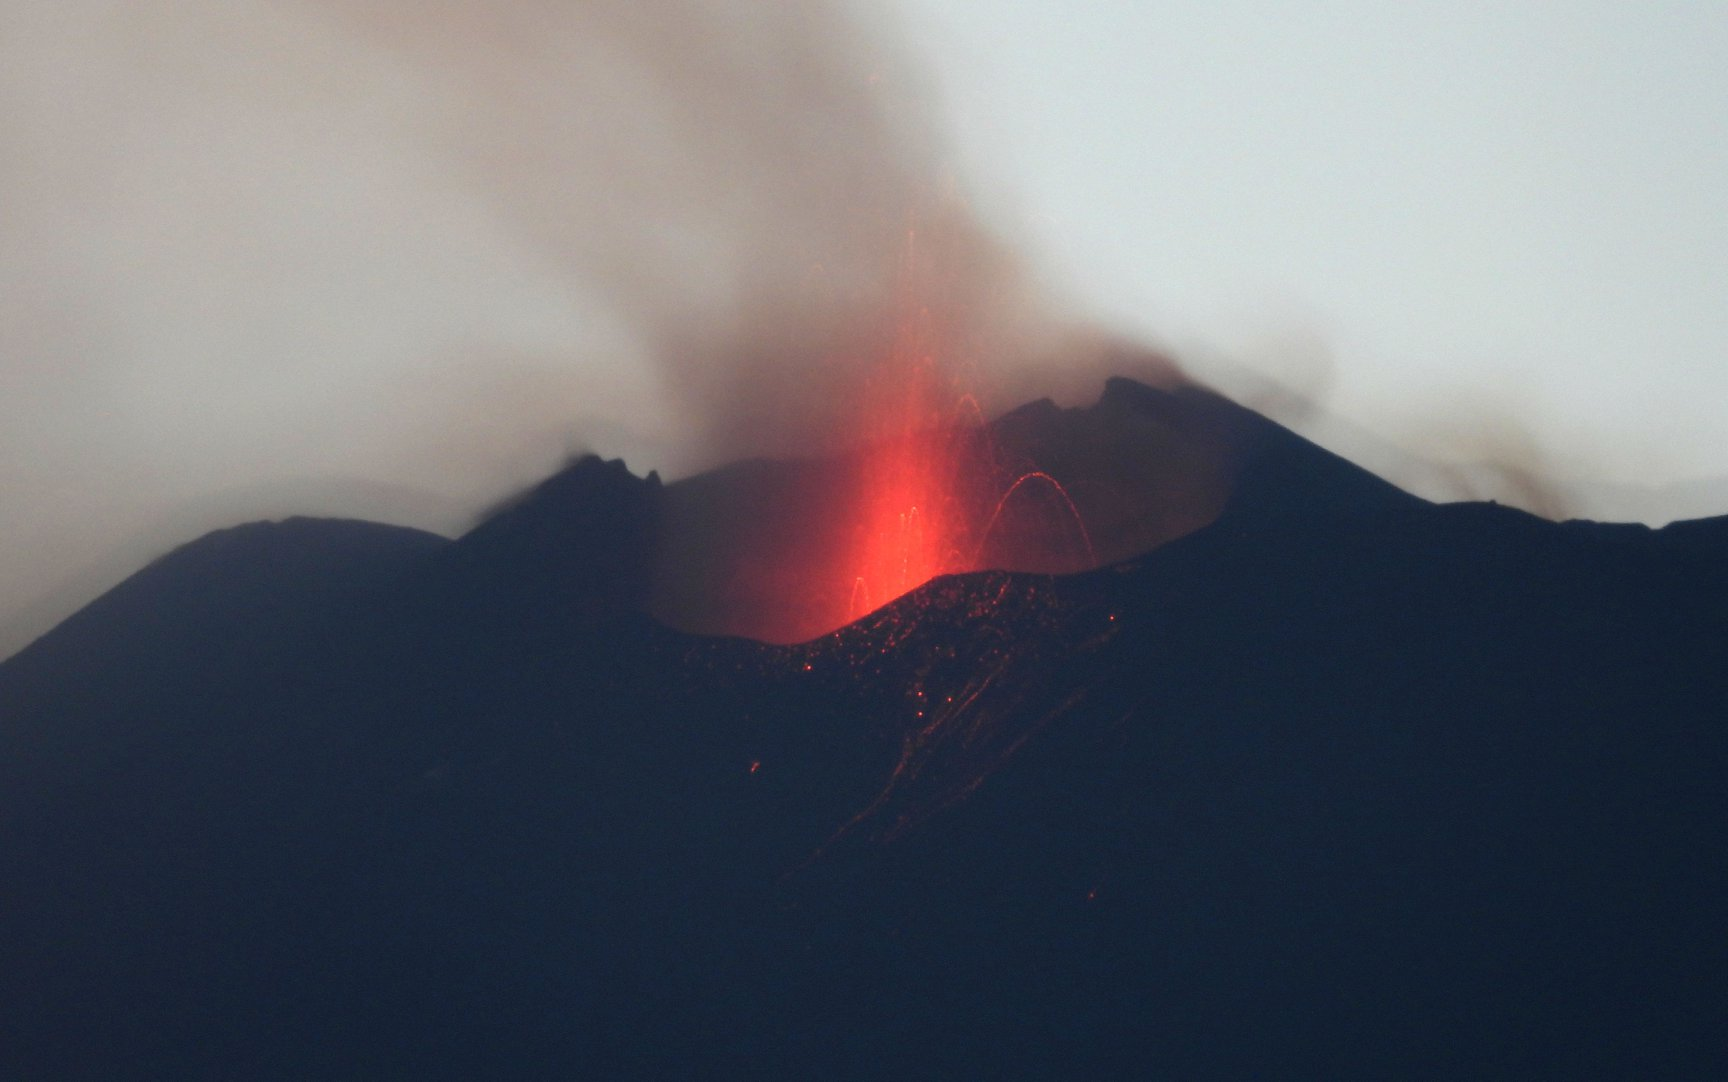 23 Juillet 2020. FR . Italie / Sicile : Etna , Japon : Nishinoshima , Kadovar : Papouasie Nouvelle Guinée , Equateur : Reventador , Guatemala : Pacaya .